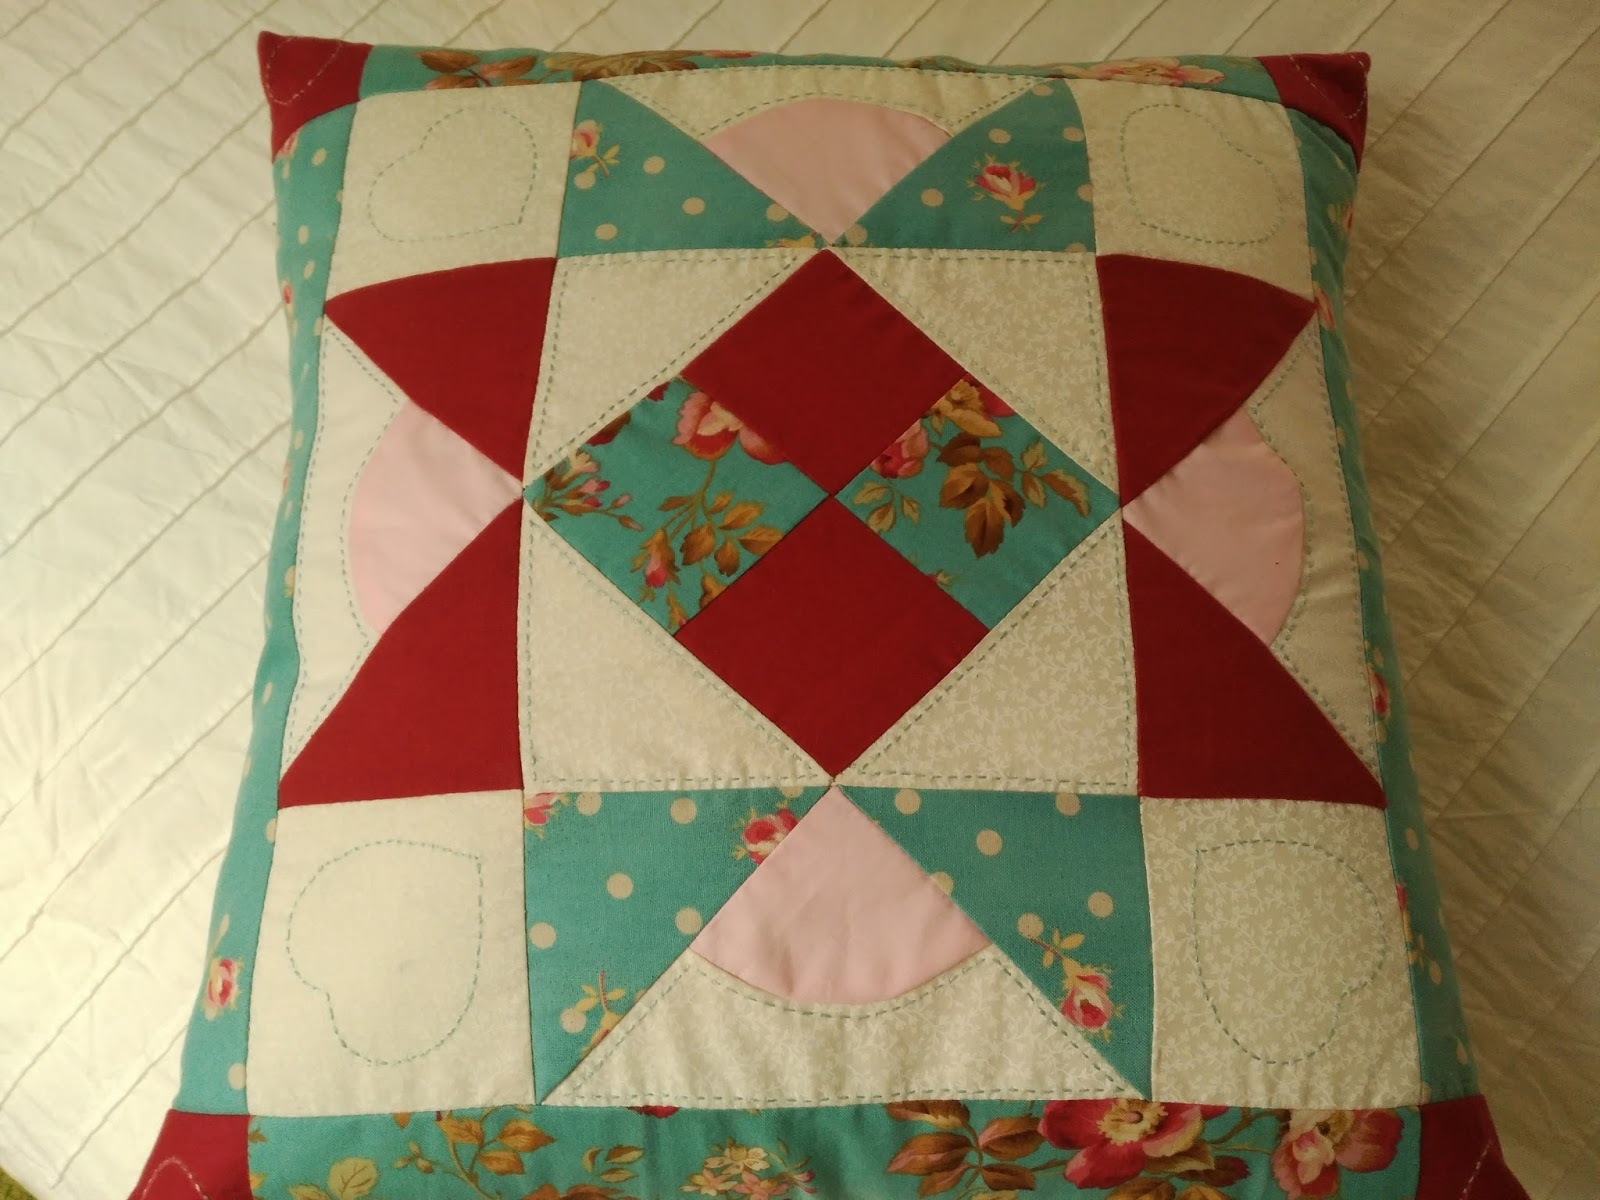 La caja en blanco cojines patchwork - Cojines de patchwork ...